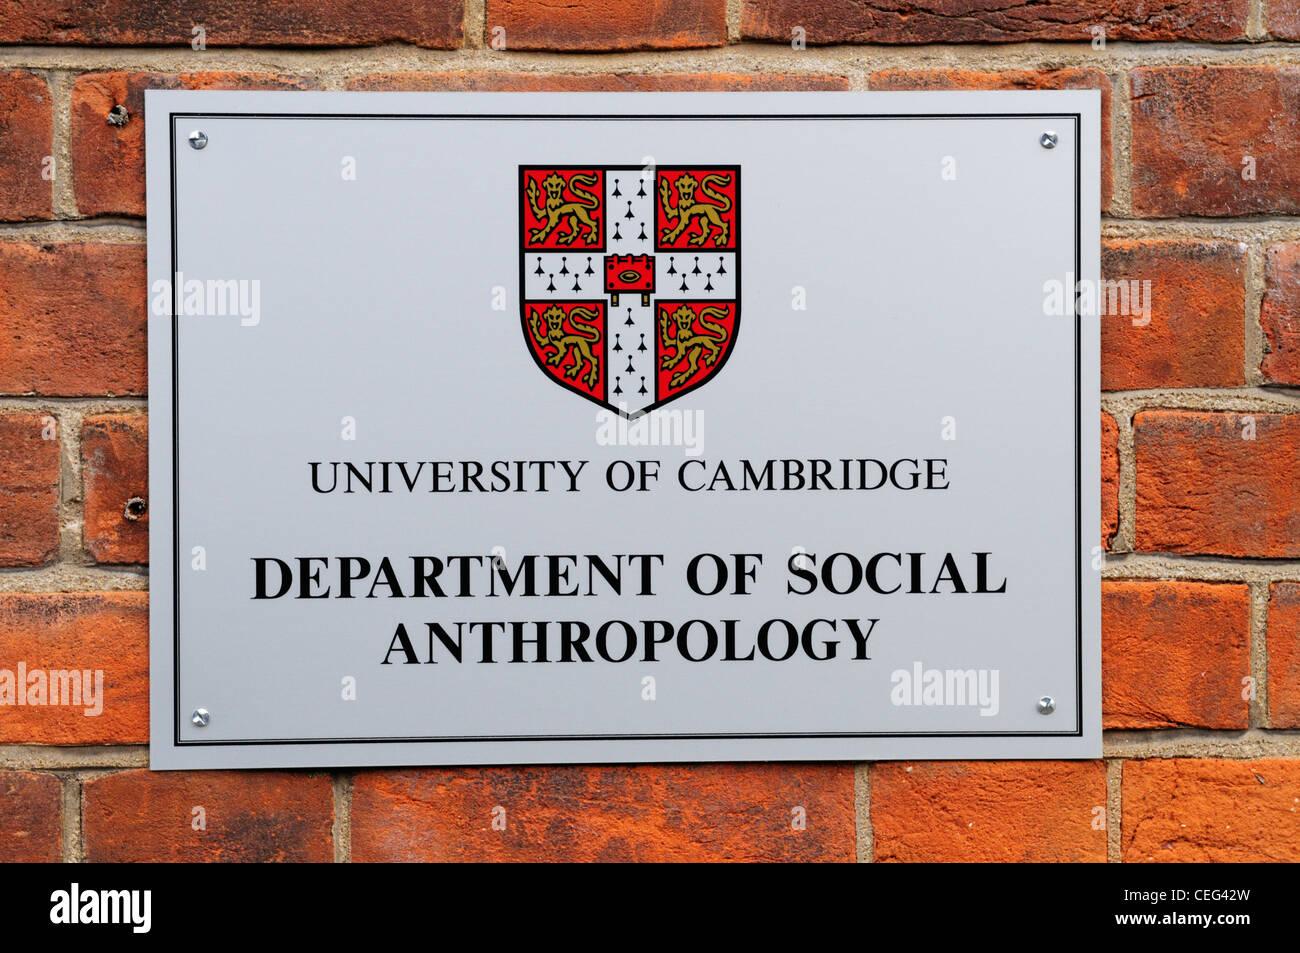 University of Cambridge Department of Social Anthropology, Free School Lane, Cambridge, England, UK - Stock Image